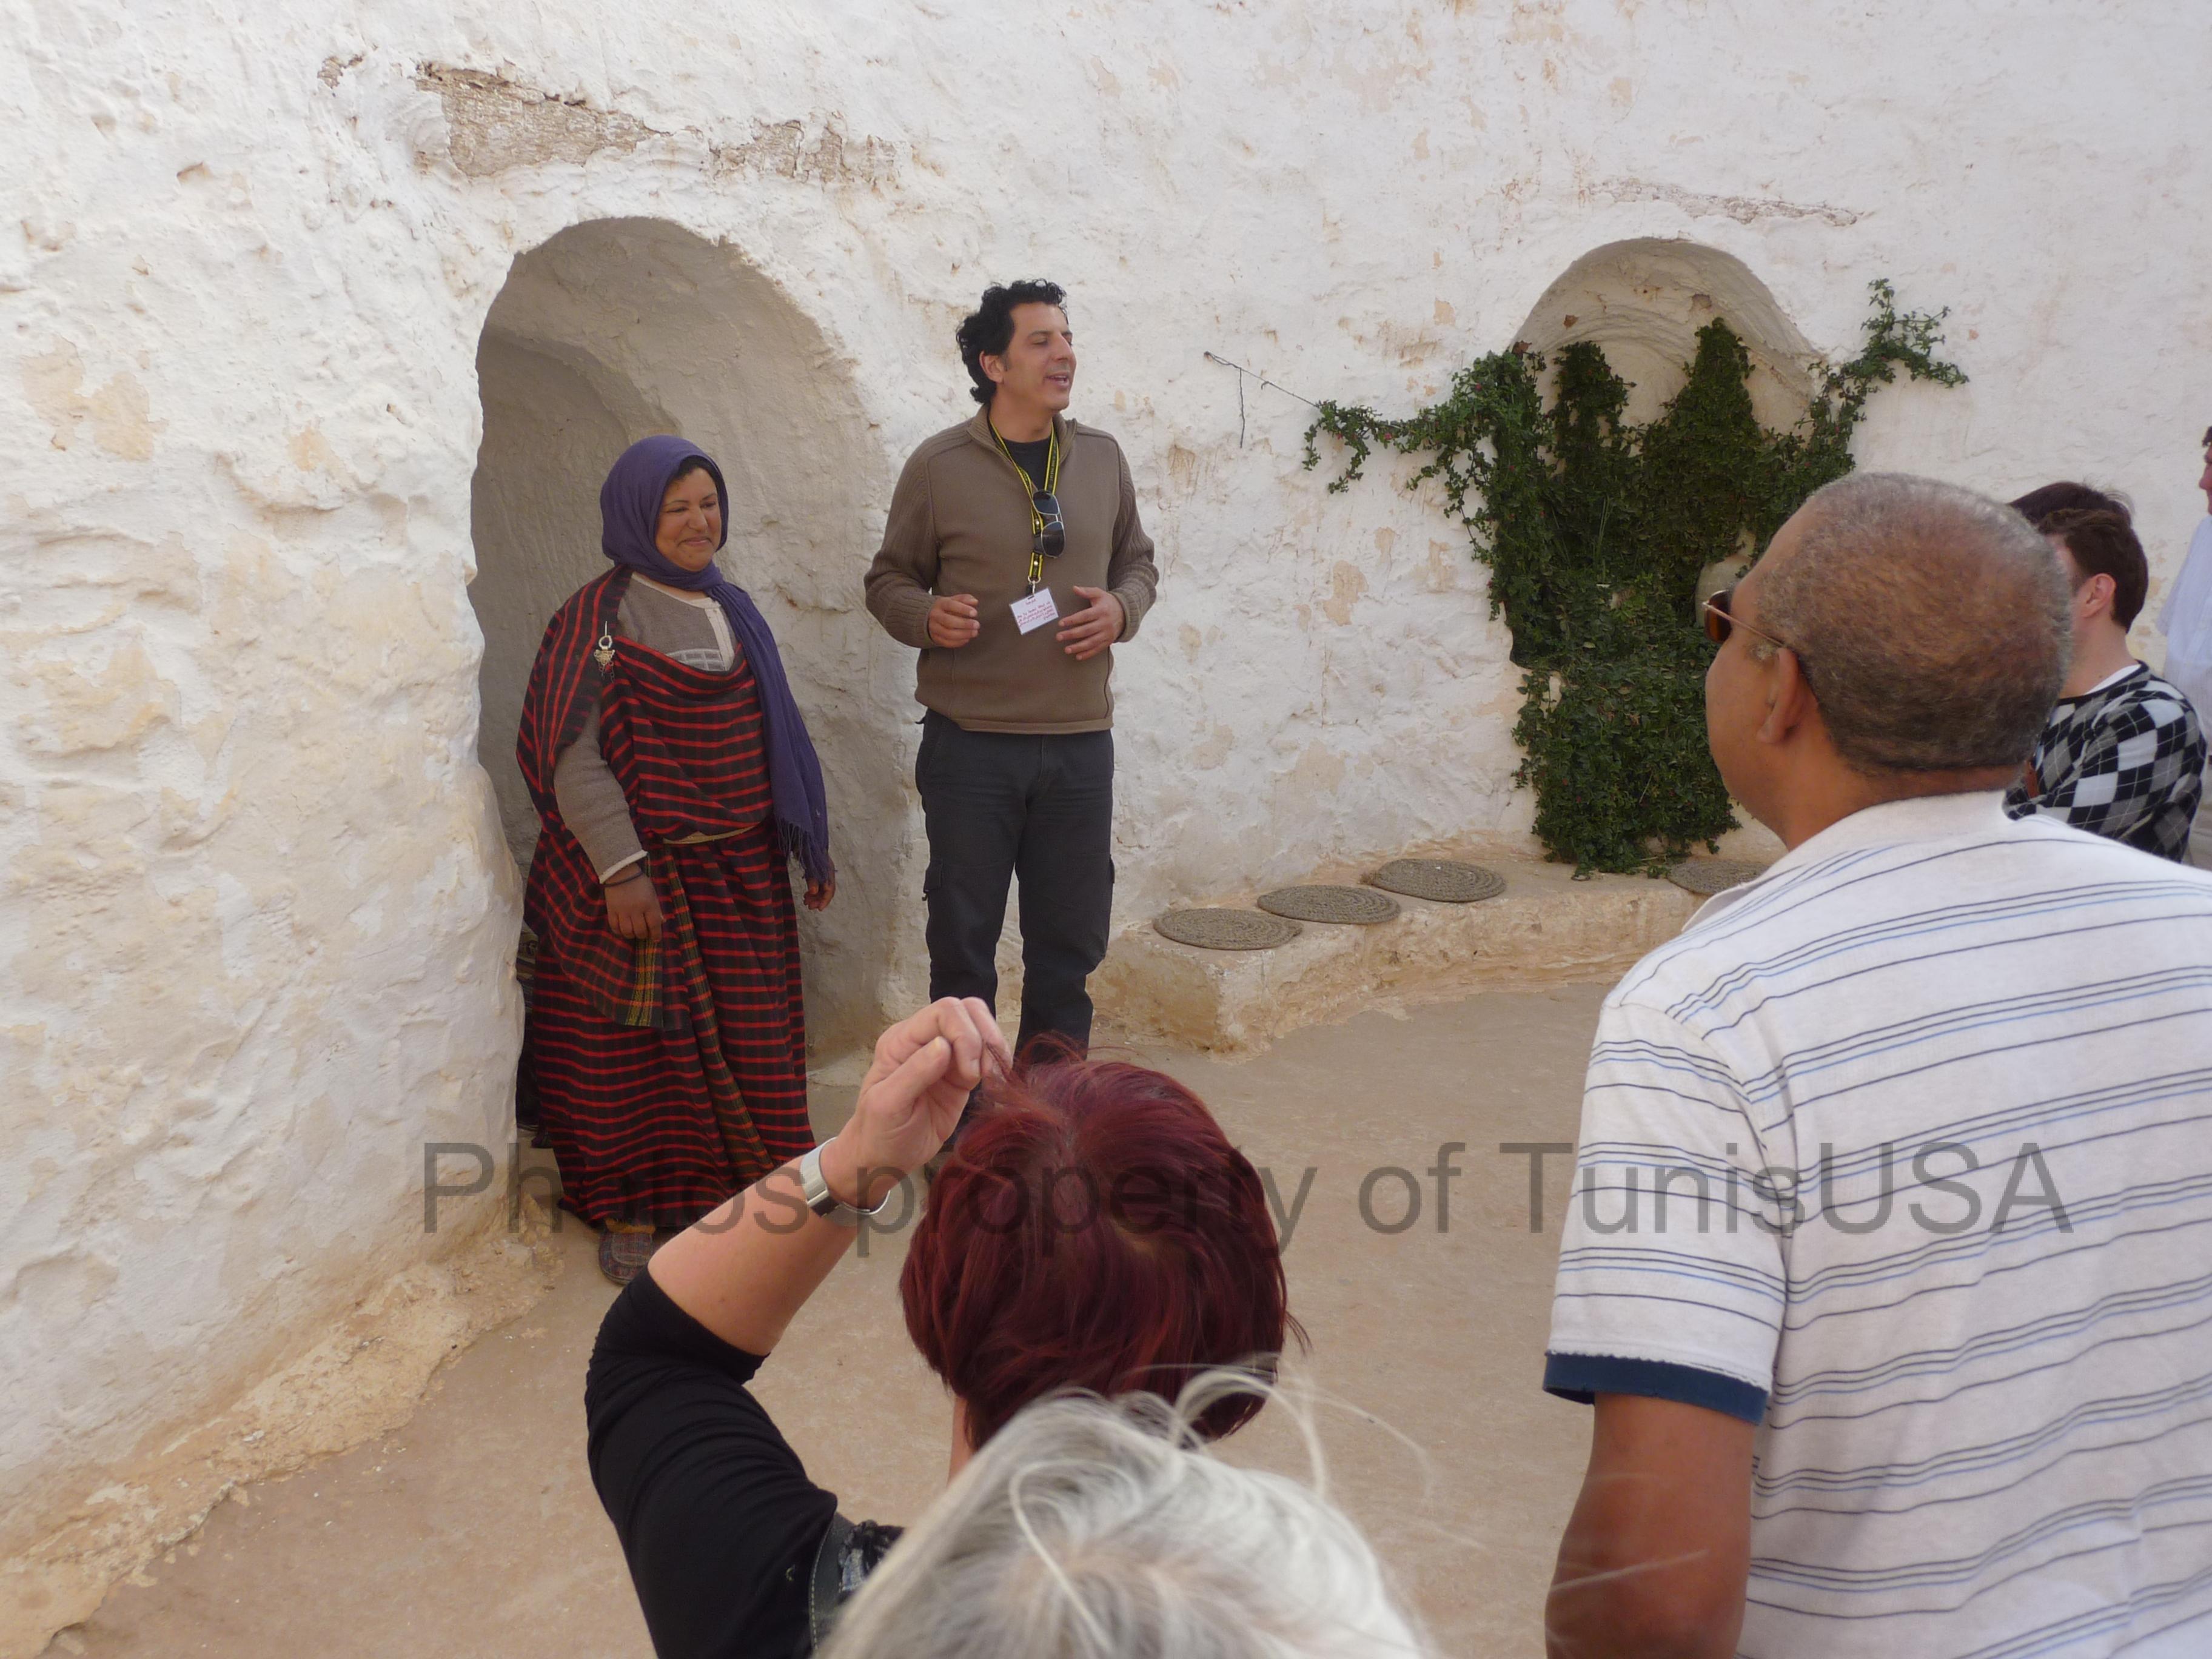 Tunisia Matmata with group